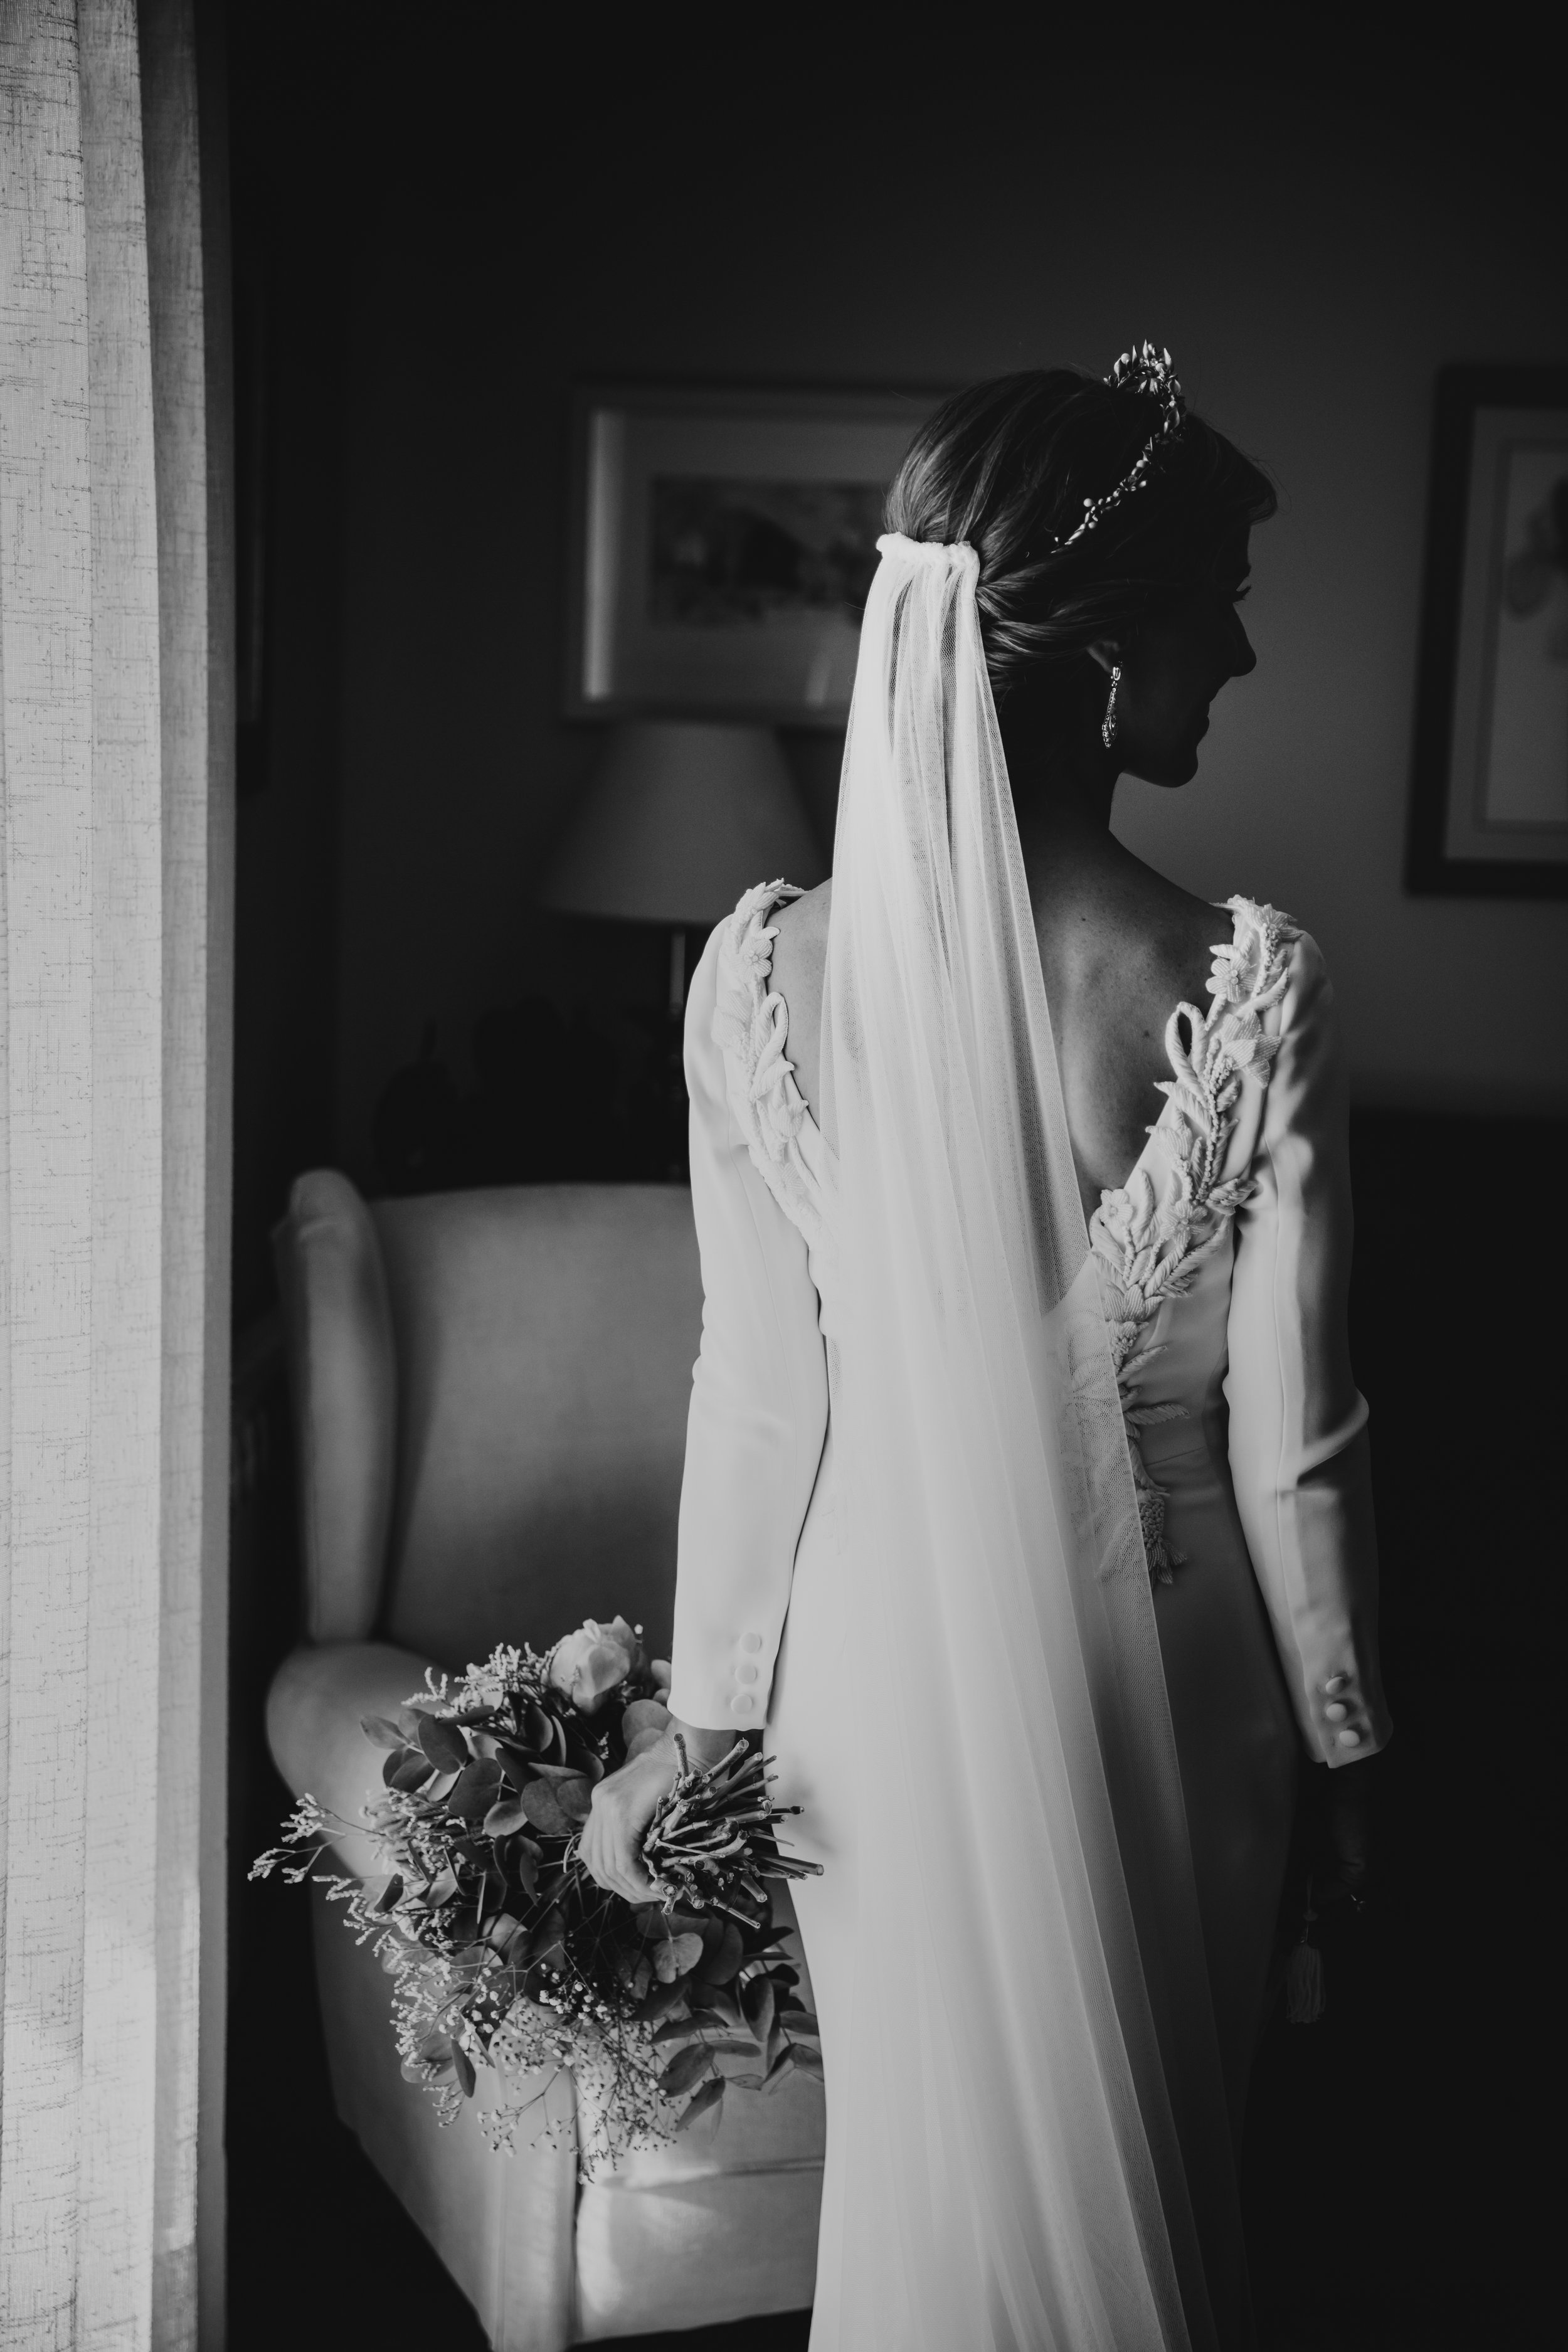 fotografo-bodas-granada-catedral-sagrario-jose-reyes_019.jpg